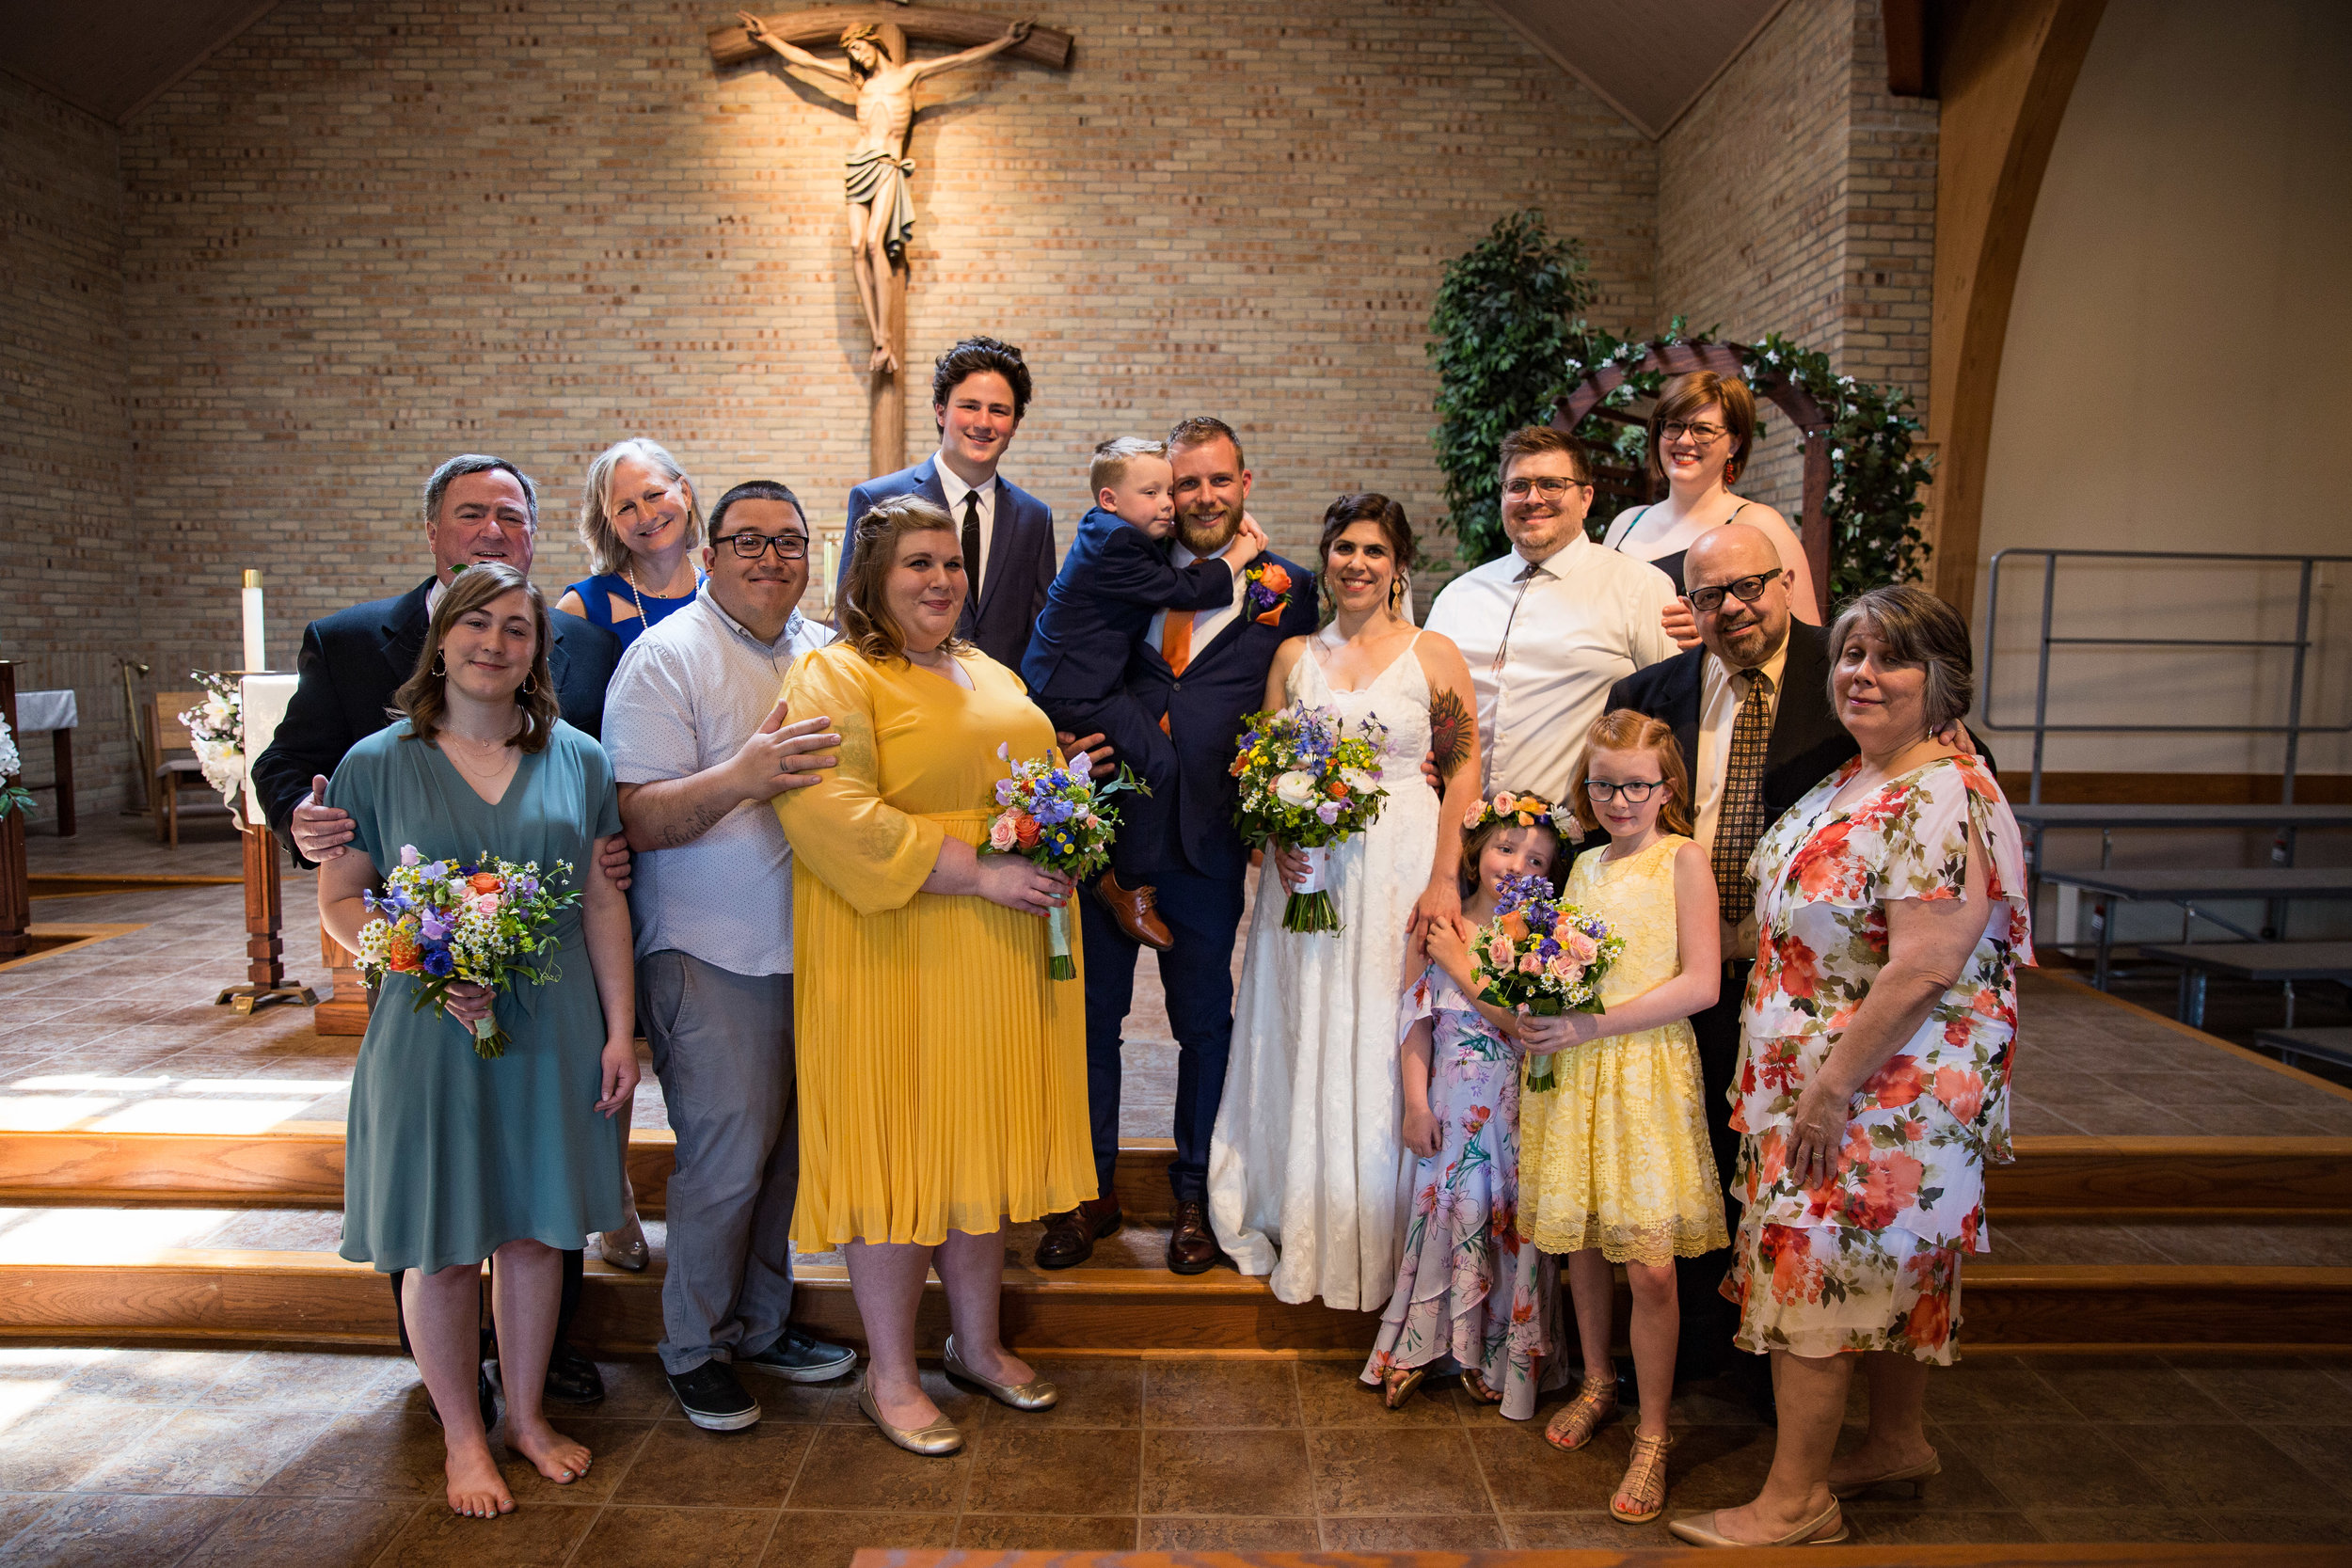 Natalie and Dallas Mooney Wedding 6-8-19_Tania Watt Photography-189.jpg